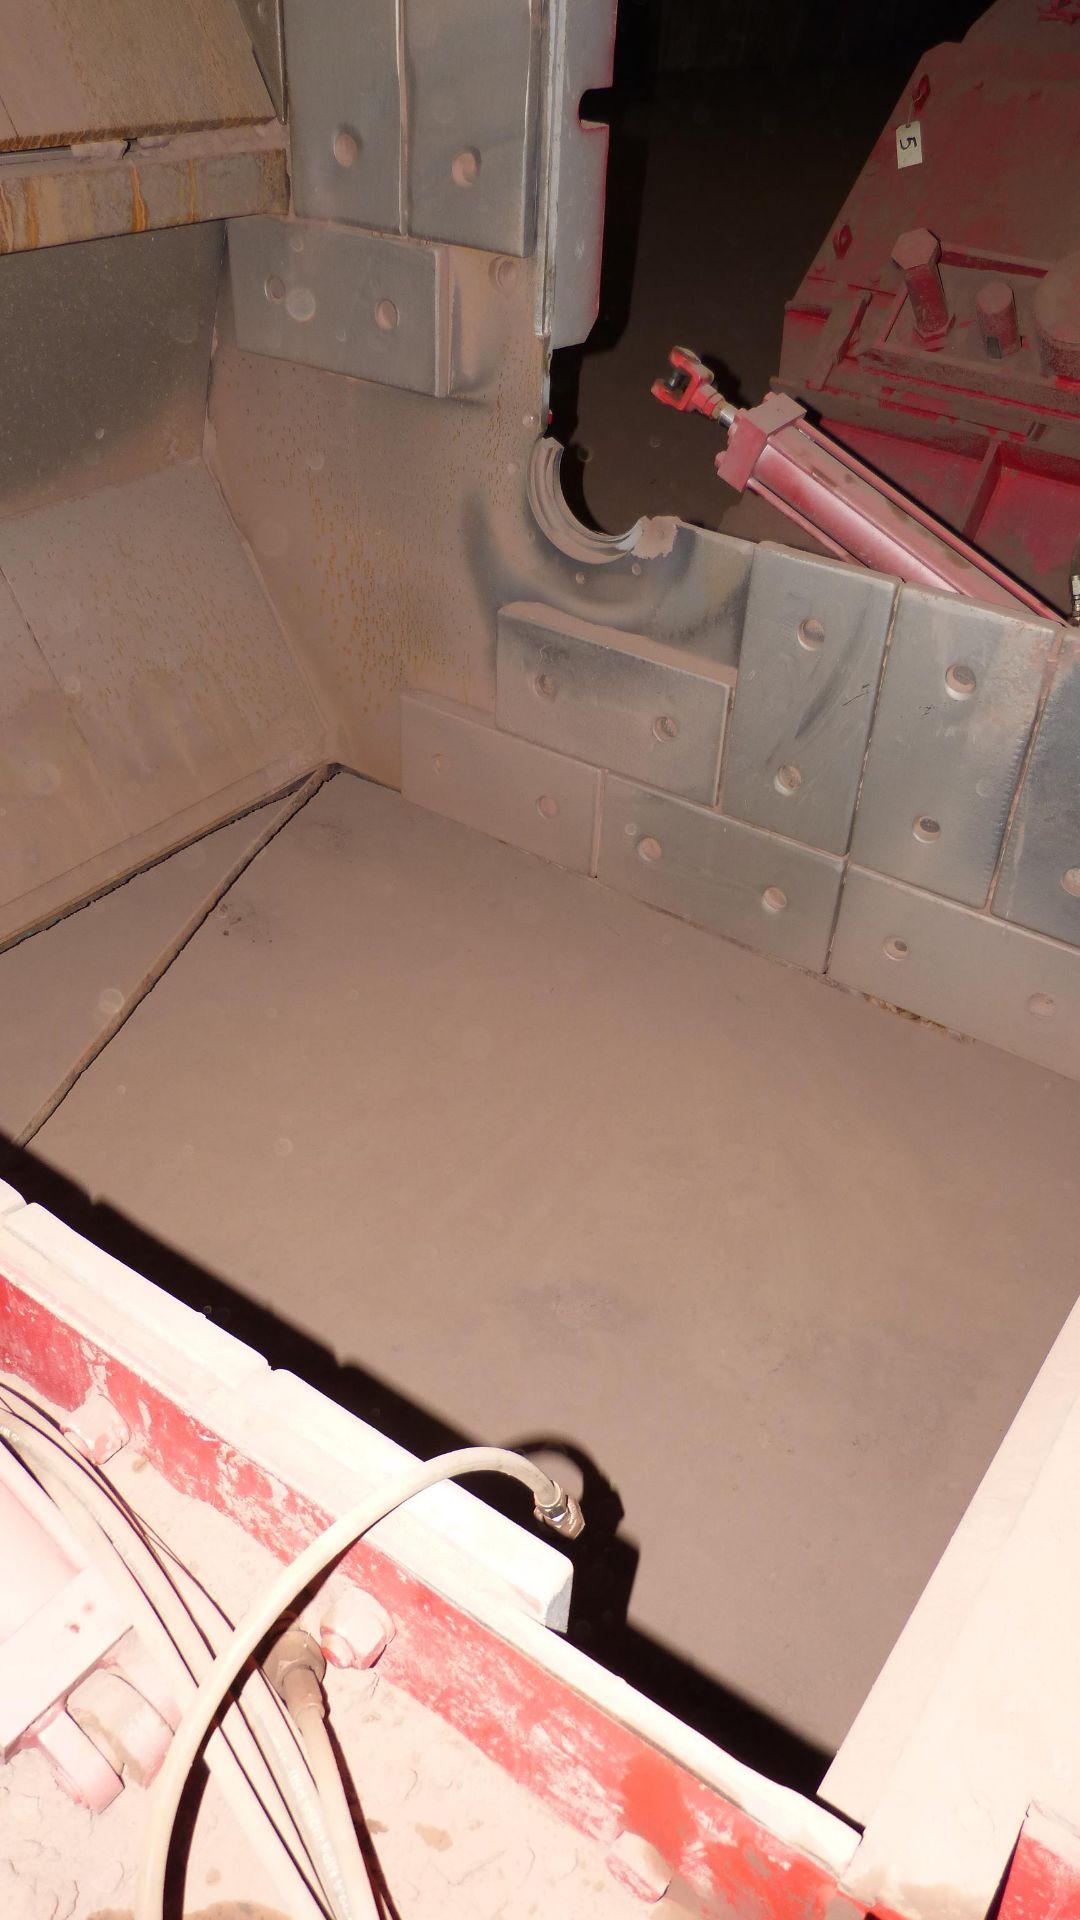 HAZEMAG IMPACT CRUSHER, MODEL 1315, 60'' DIAMETER ROTOR, 60'' WIDE, 575V, 450 HP - Image 16 of 25